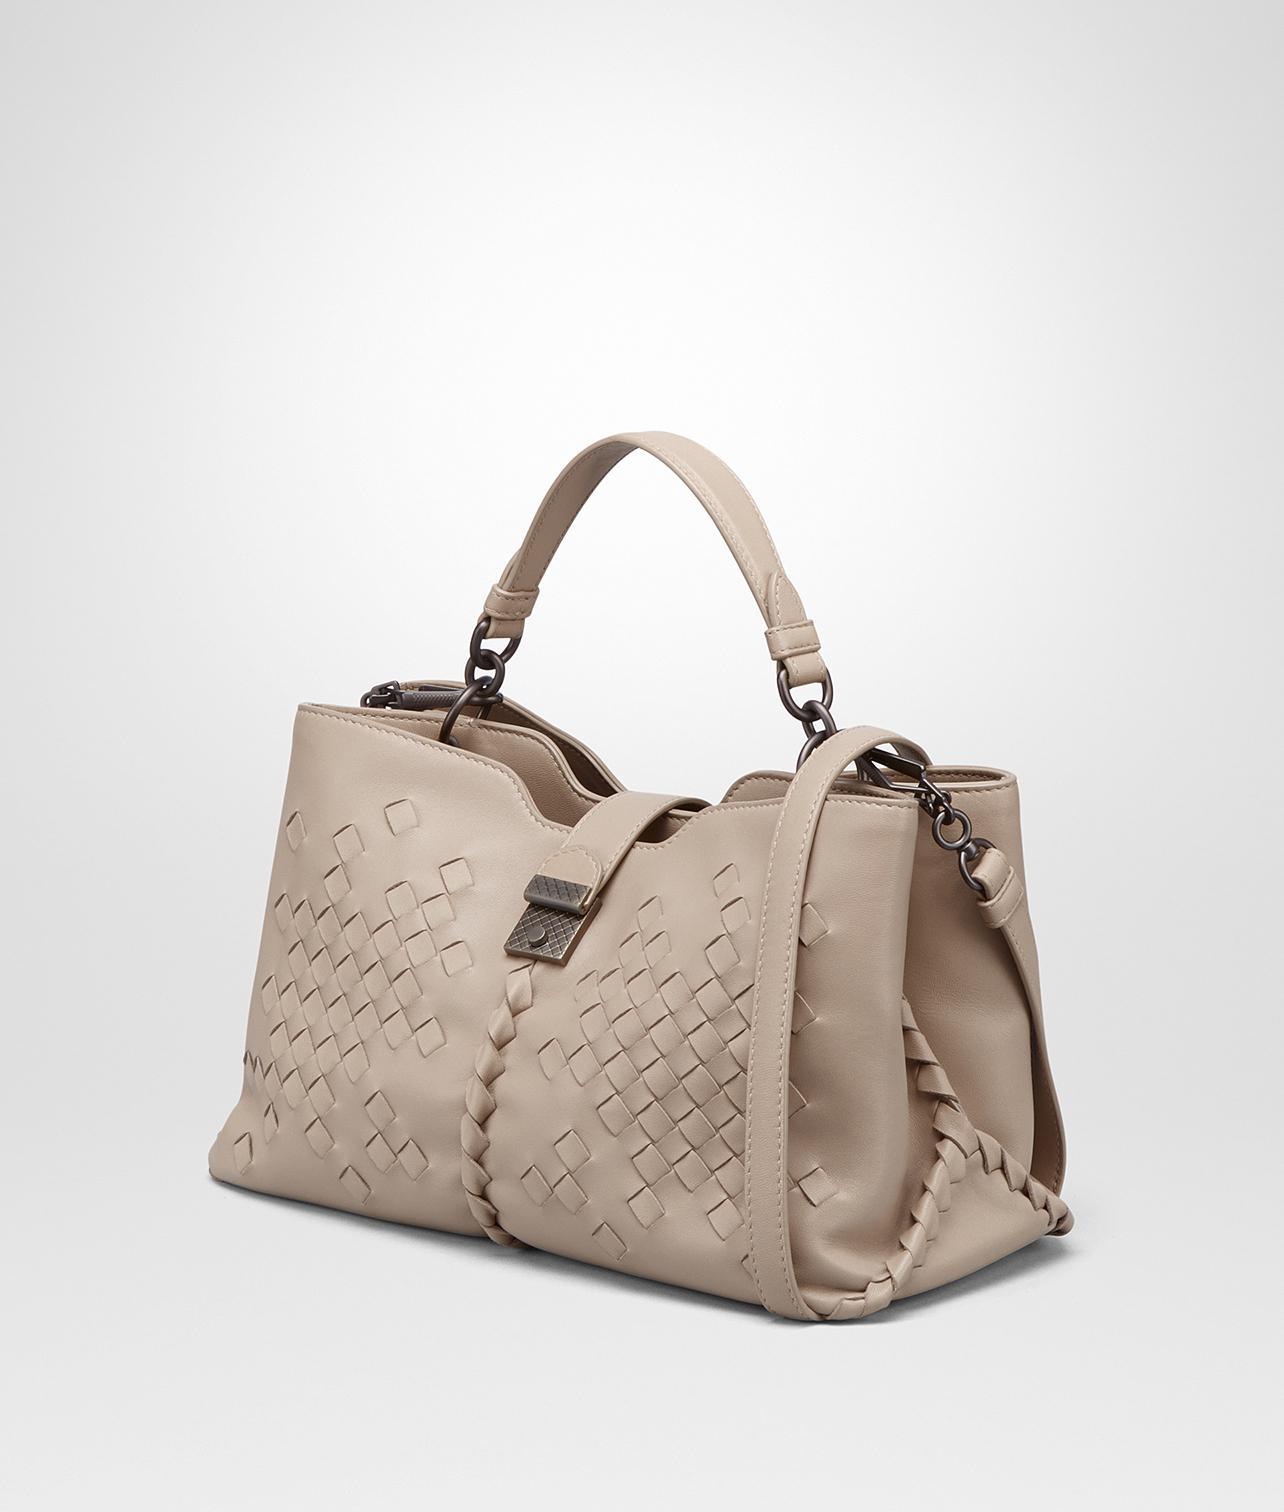 b2f1a5477d Lyst - Bottega Veneta Mink Nappa Medium Napoli Bag